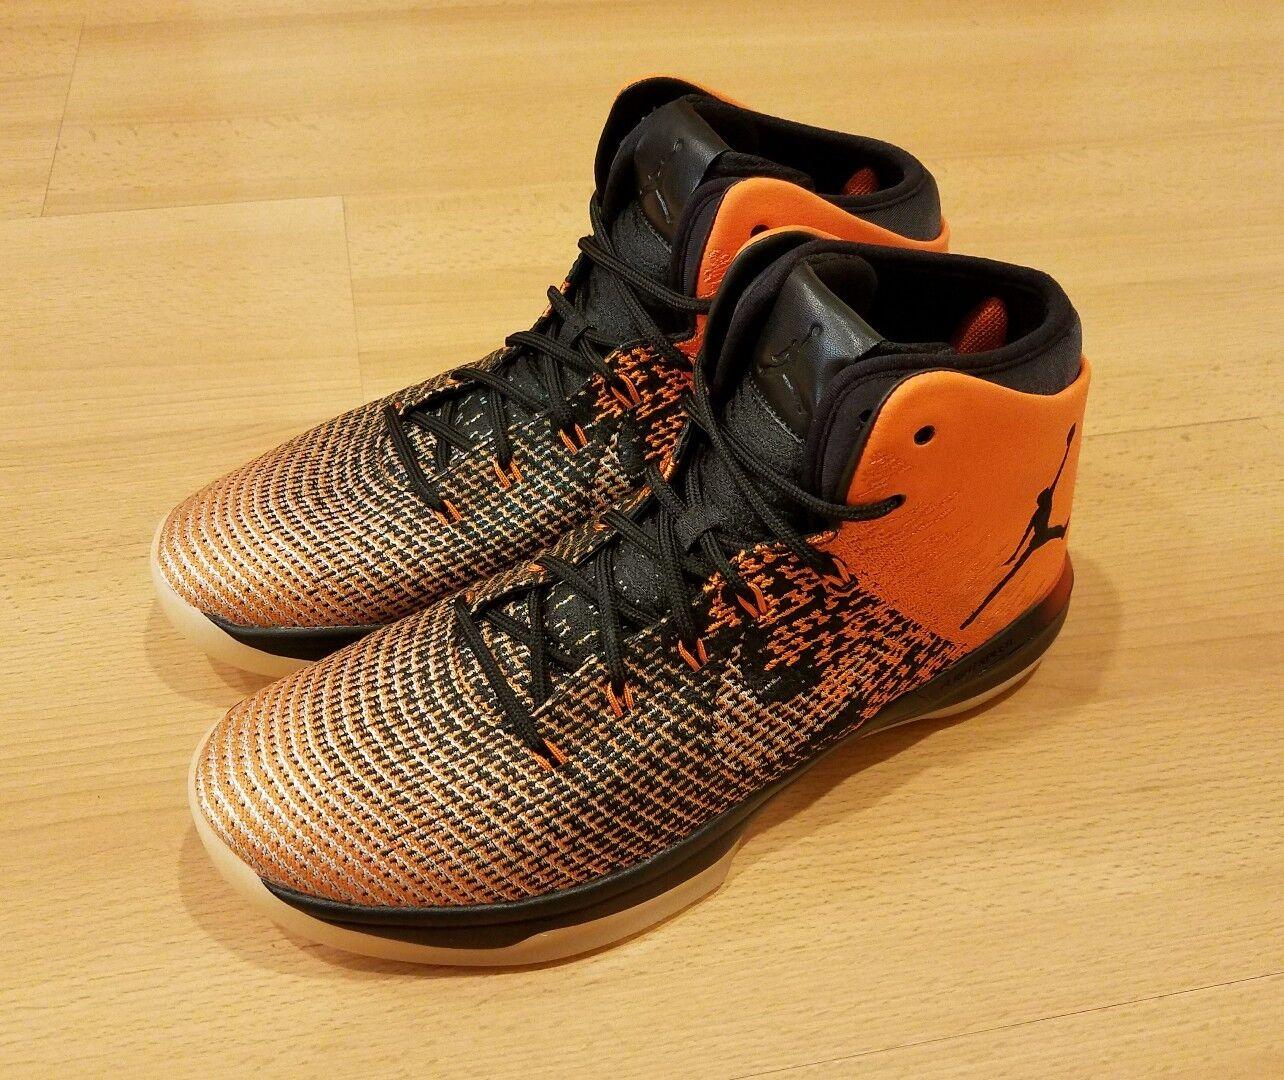 Nike air jordan xxxl 31 in tabellone a 845037-021 forma di stella arancione 845037-021 a sz 11,5 807279